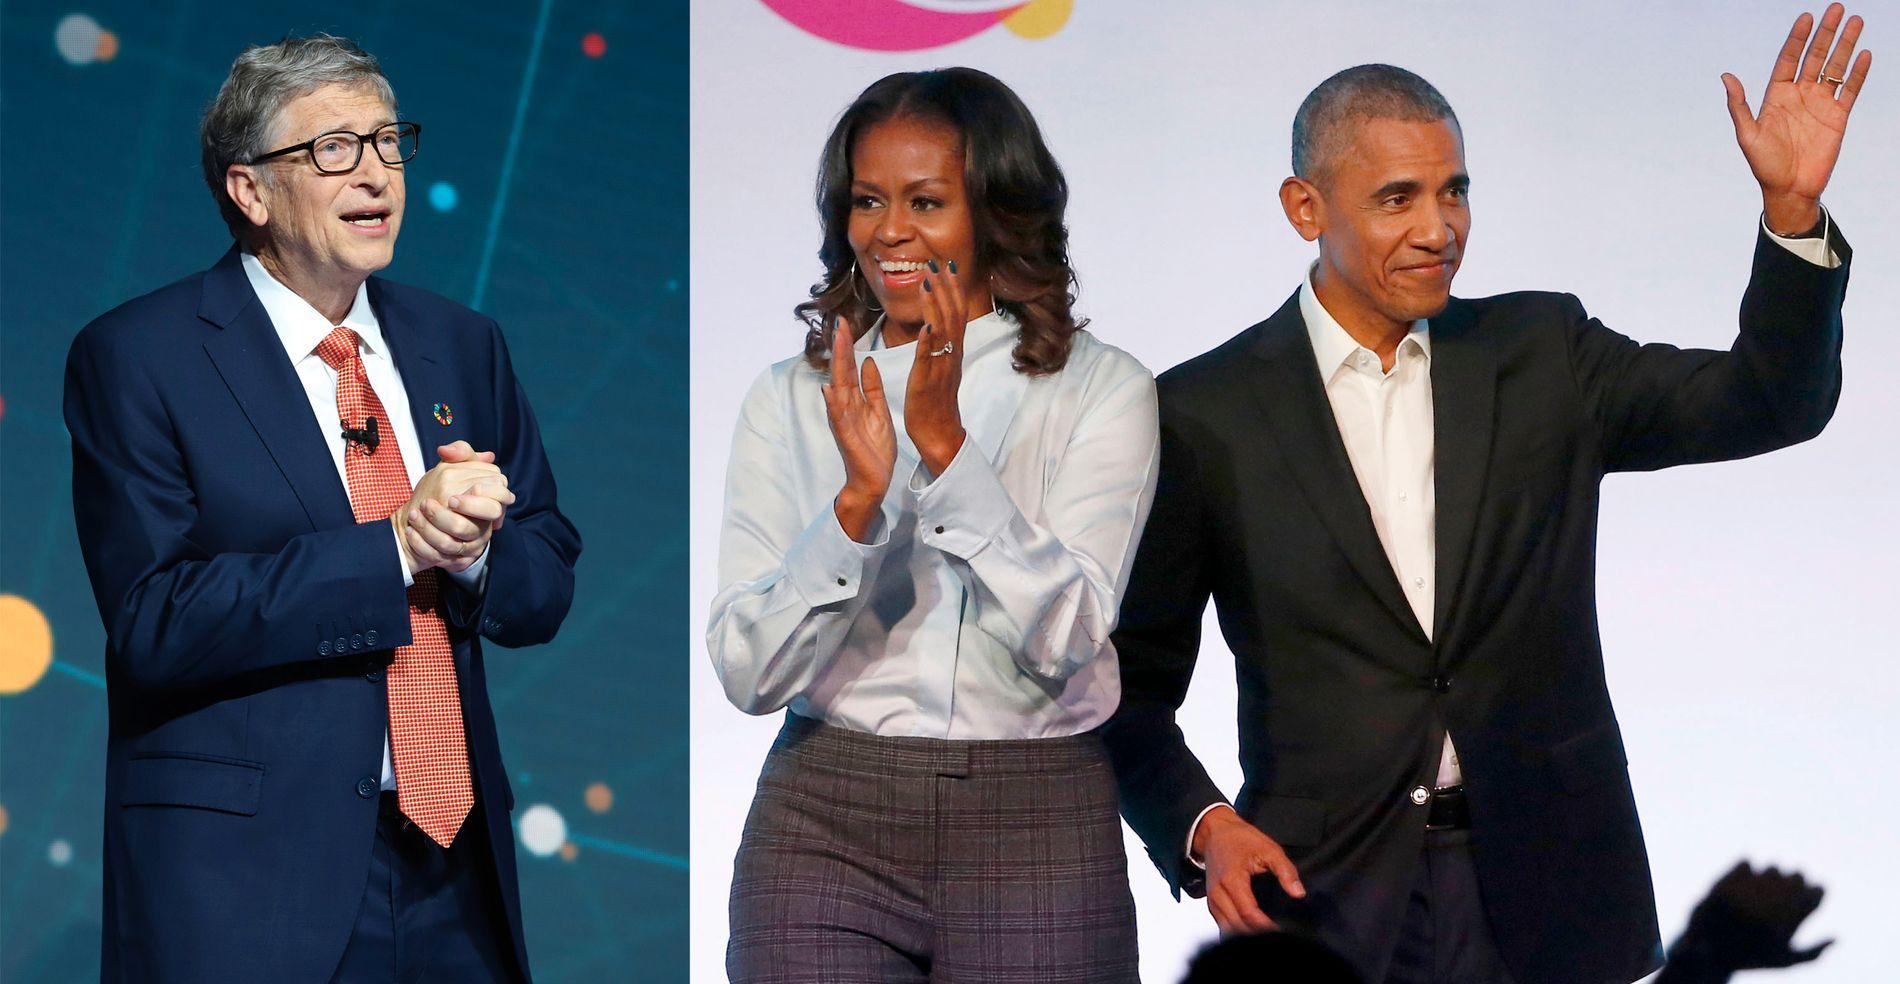 POPULÆRE: Bill Gates, Michelle og Barack Obama er de tre personene vi beundrer mest.